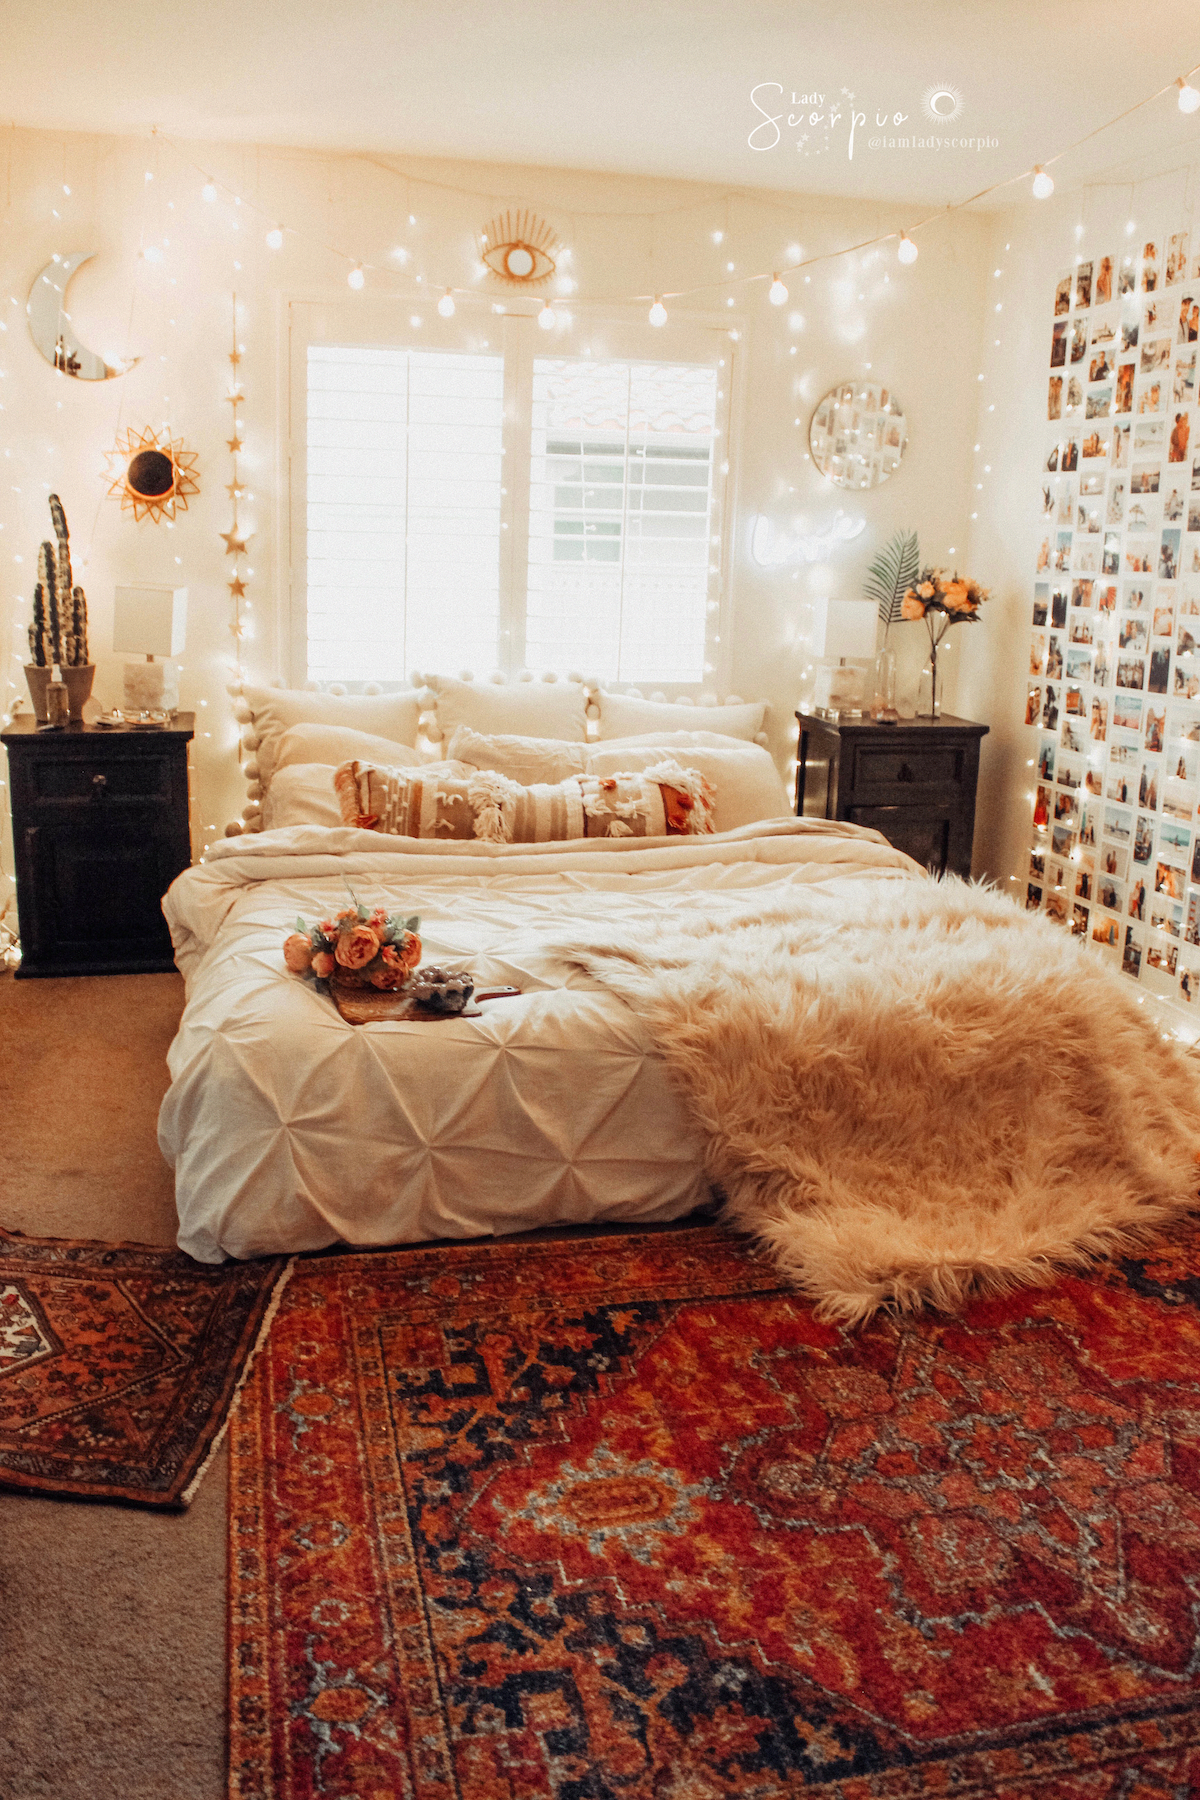 Bedroom Designer Ideas To Decorate My Room Decorative Home